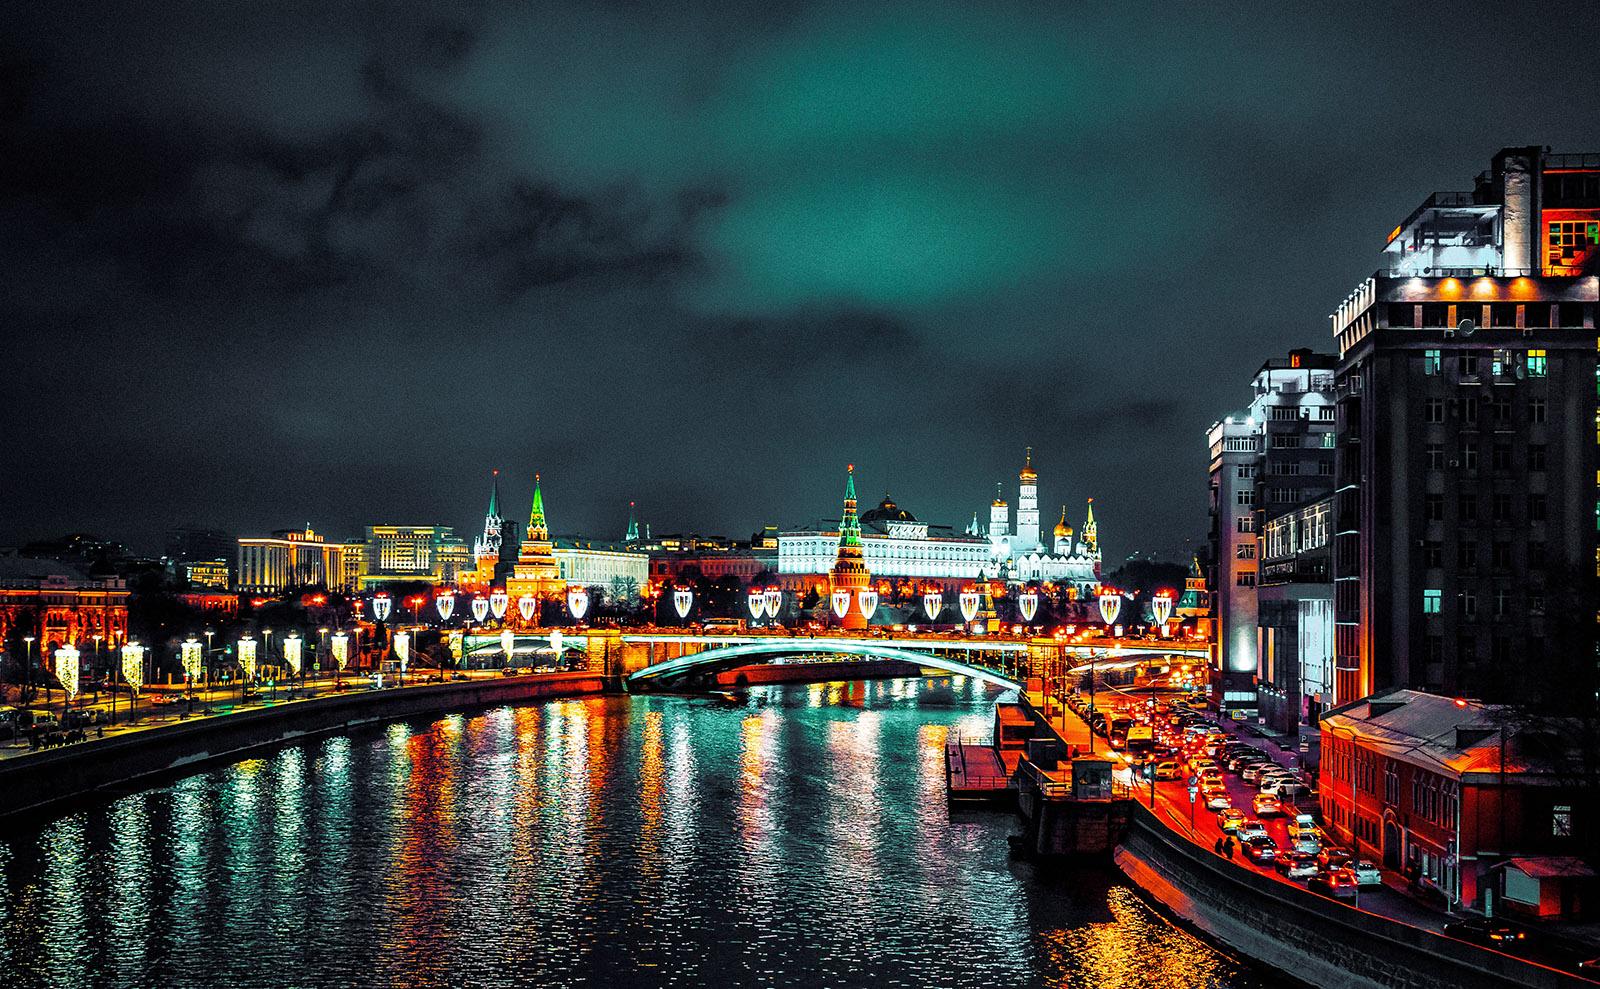 SSoP Podcast Episode 08 — Russia: Revolution, Hope, and Vodka